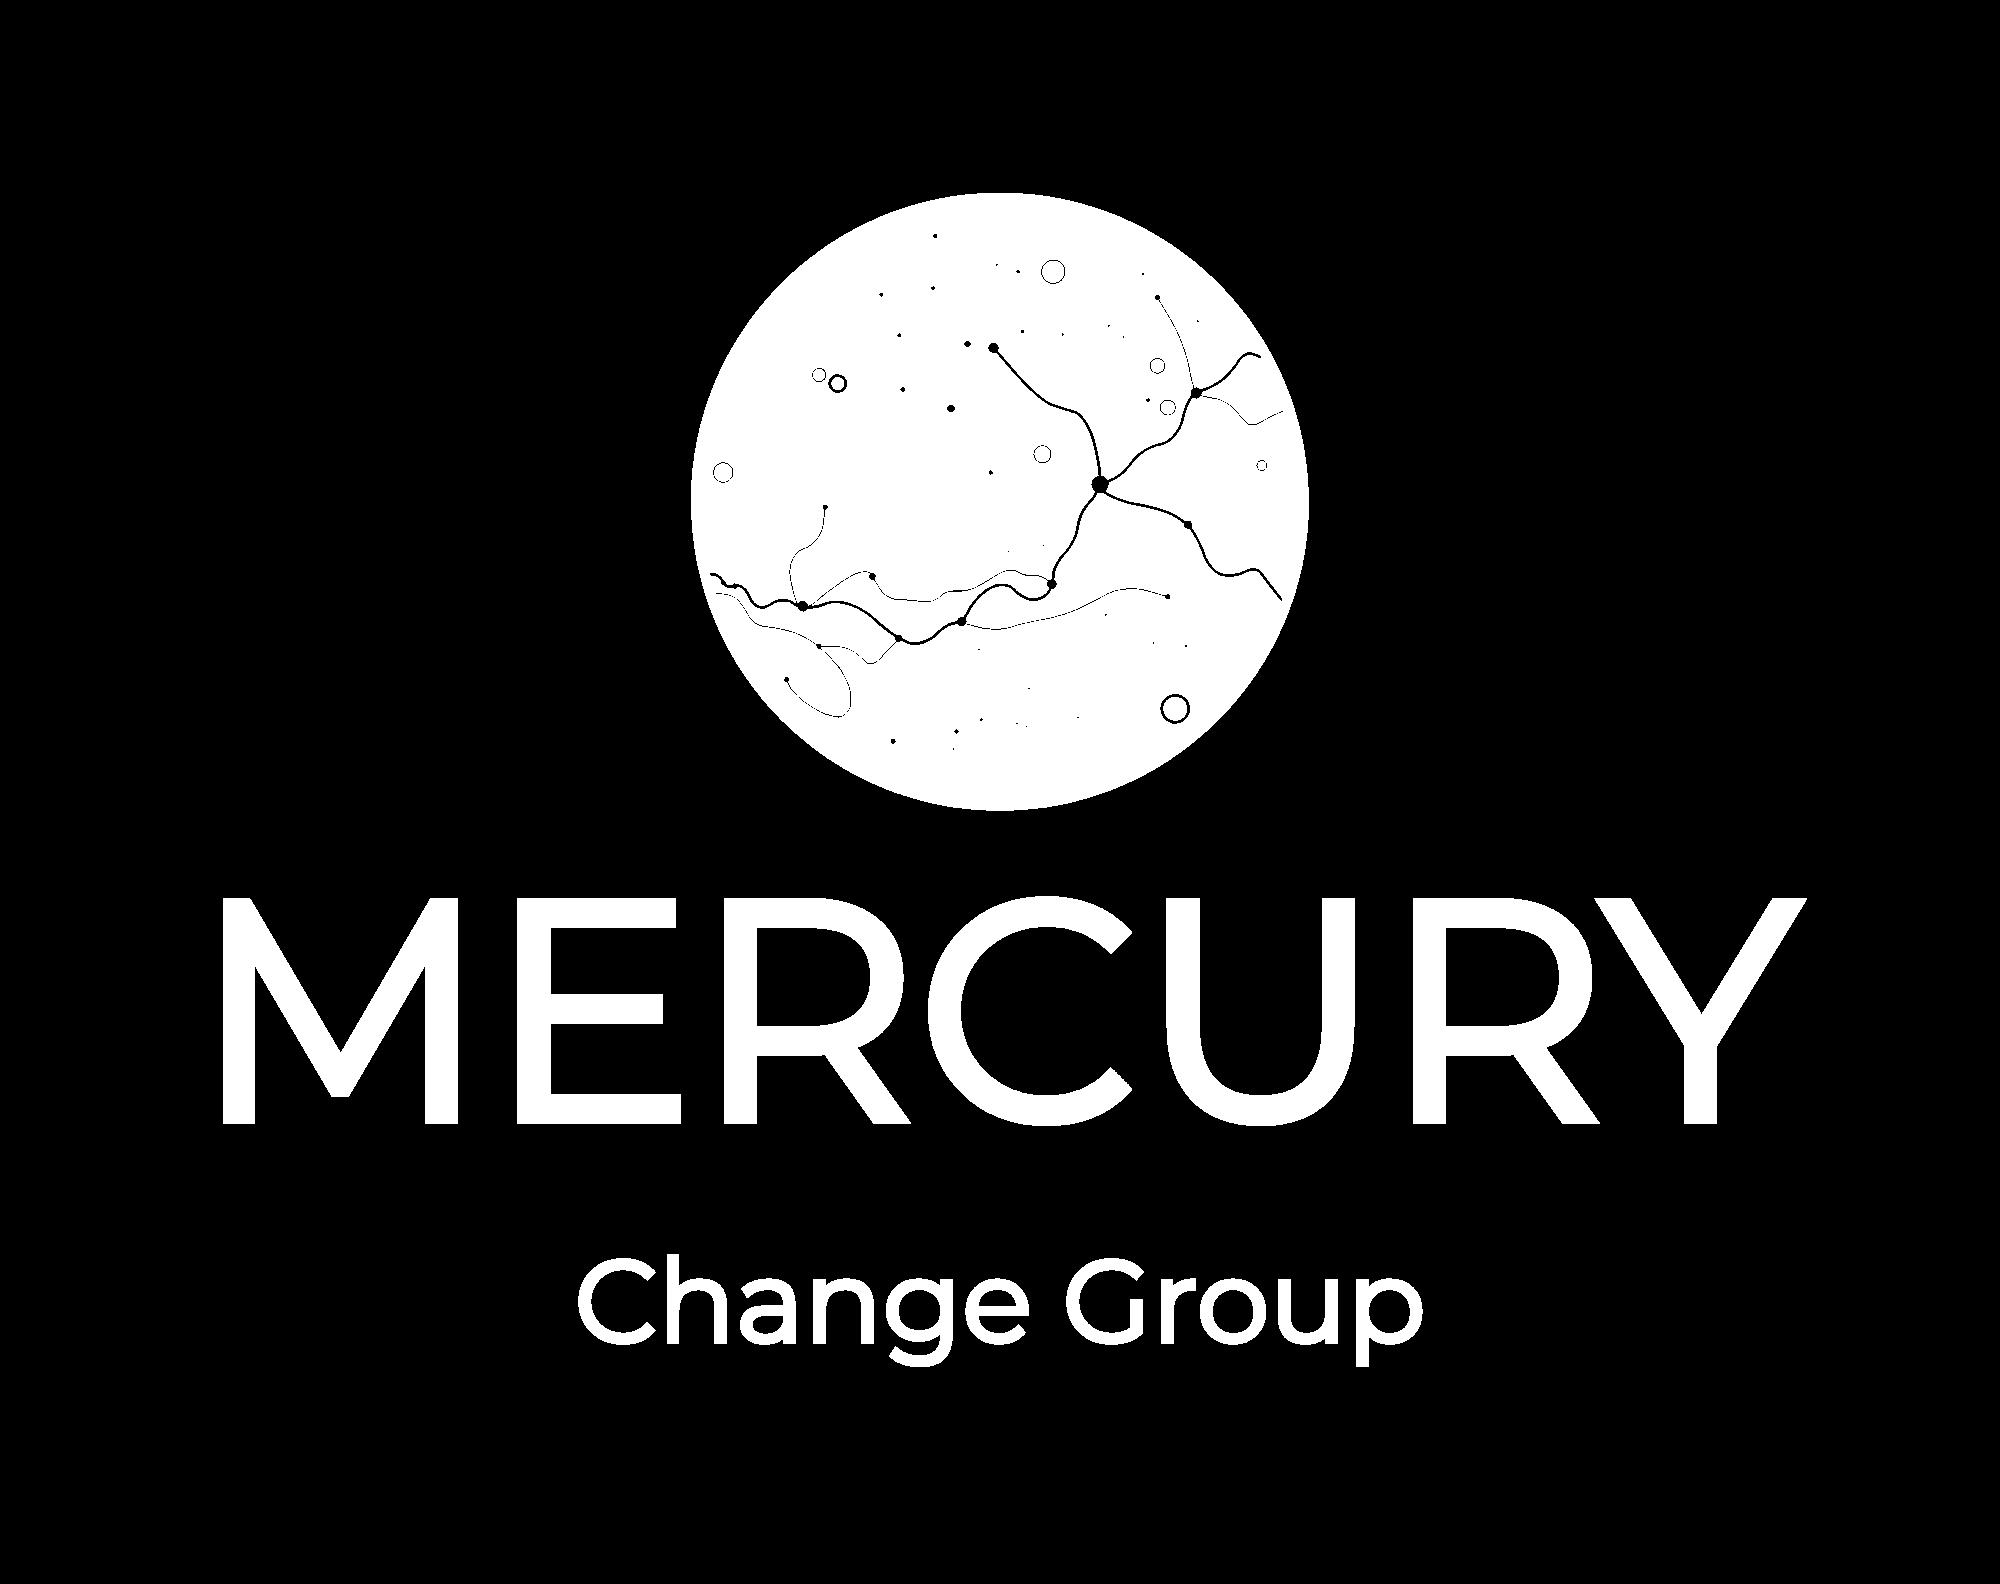 MERCURY-logo-white.png